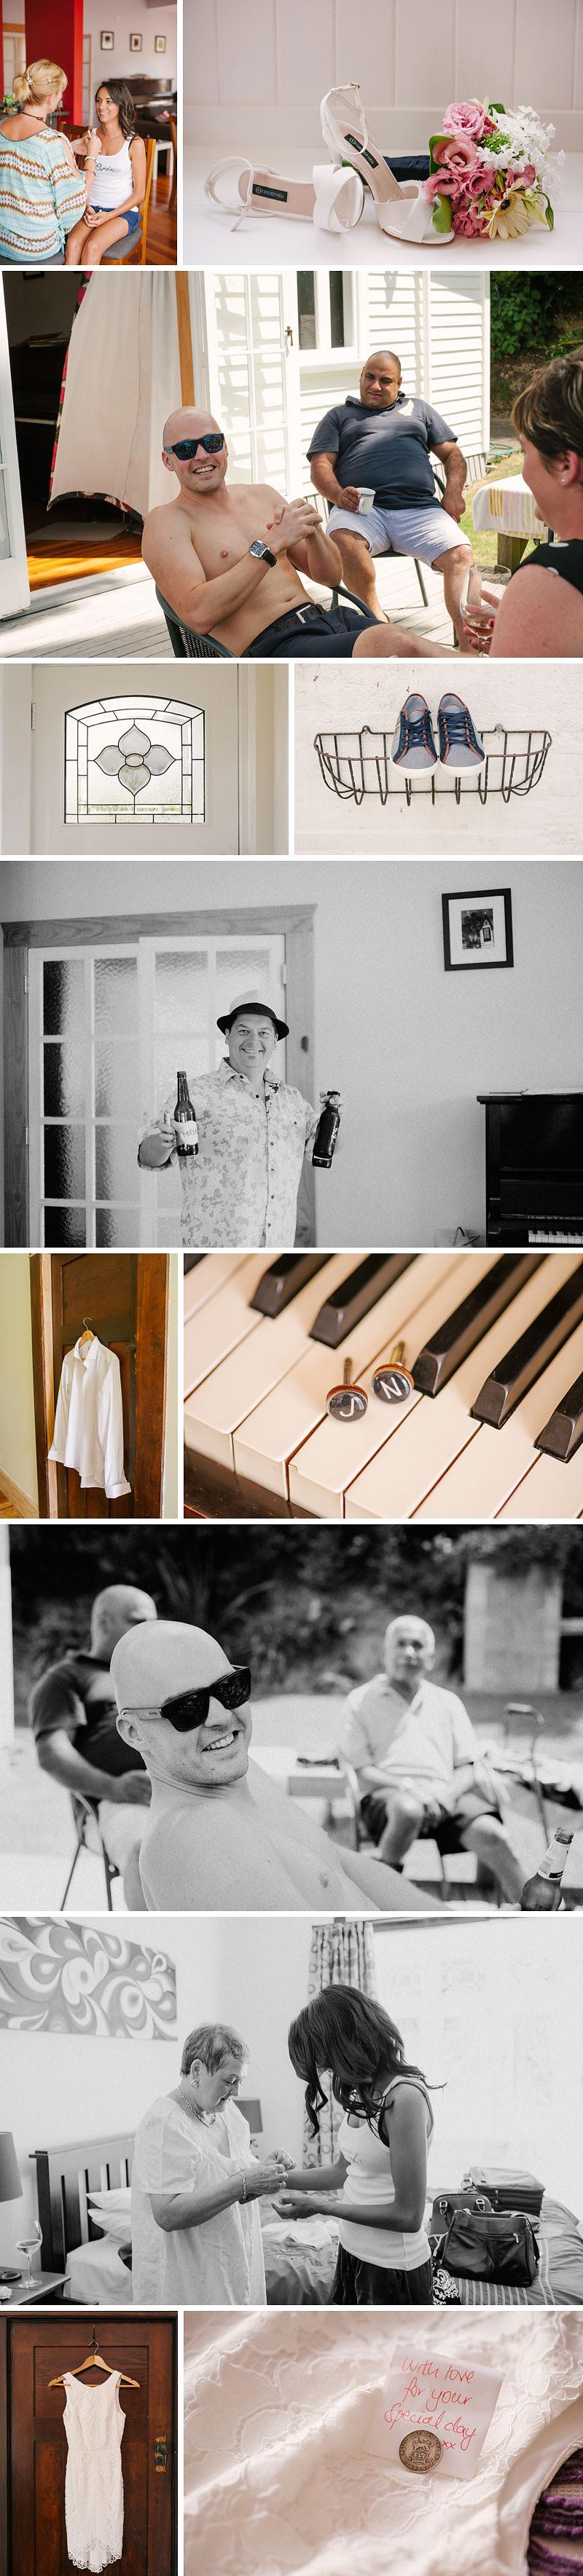 Russell Wedding Photographer Jess Burges_Exposure photographics